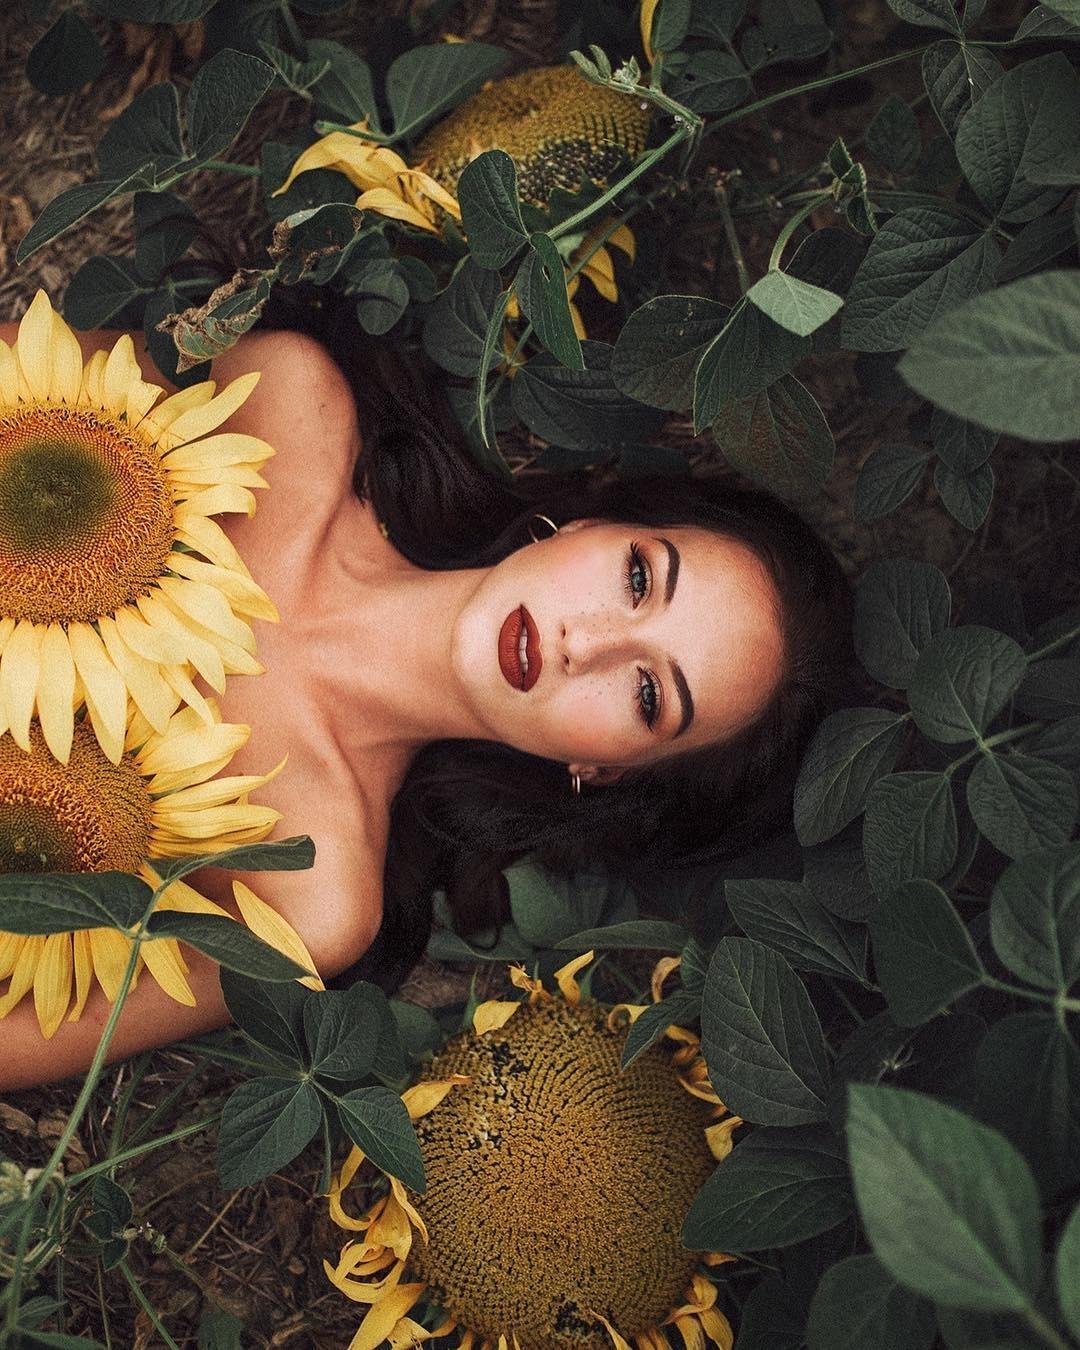 Marvelous Portraits Jenna Kay - Lifestyle - photogrist | ello